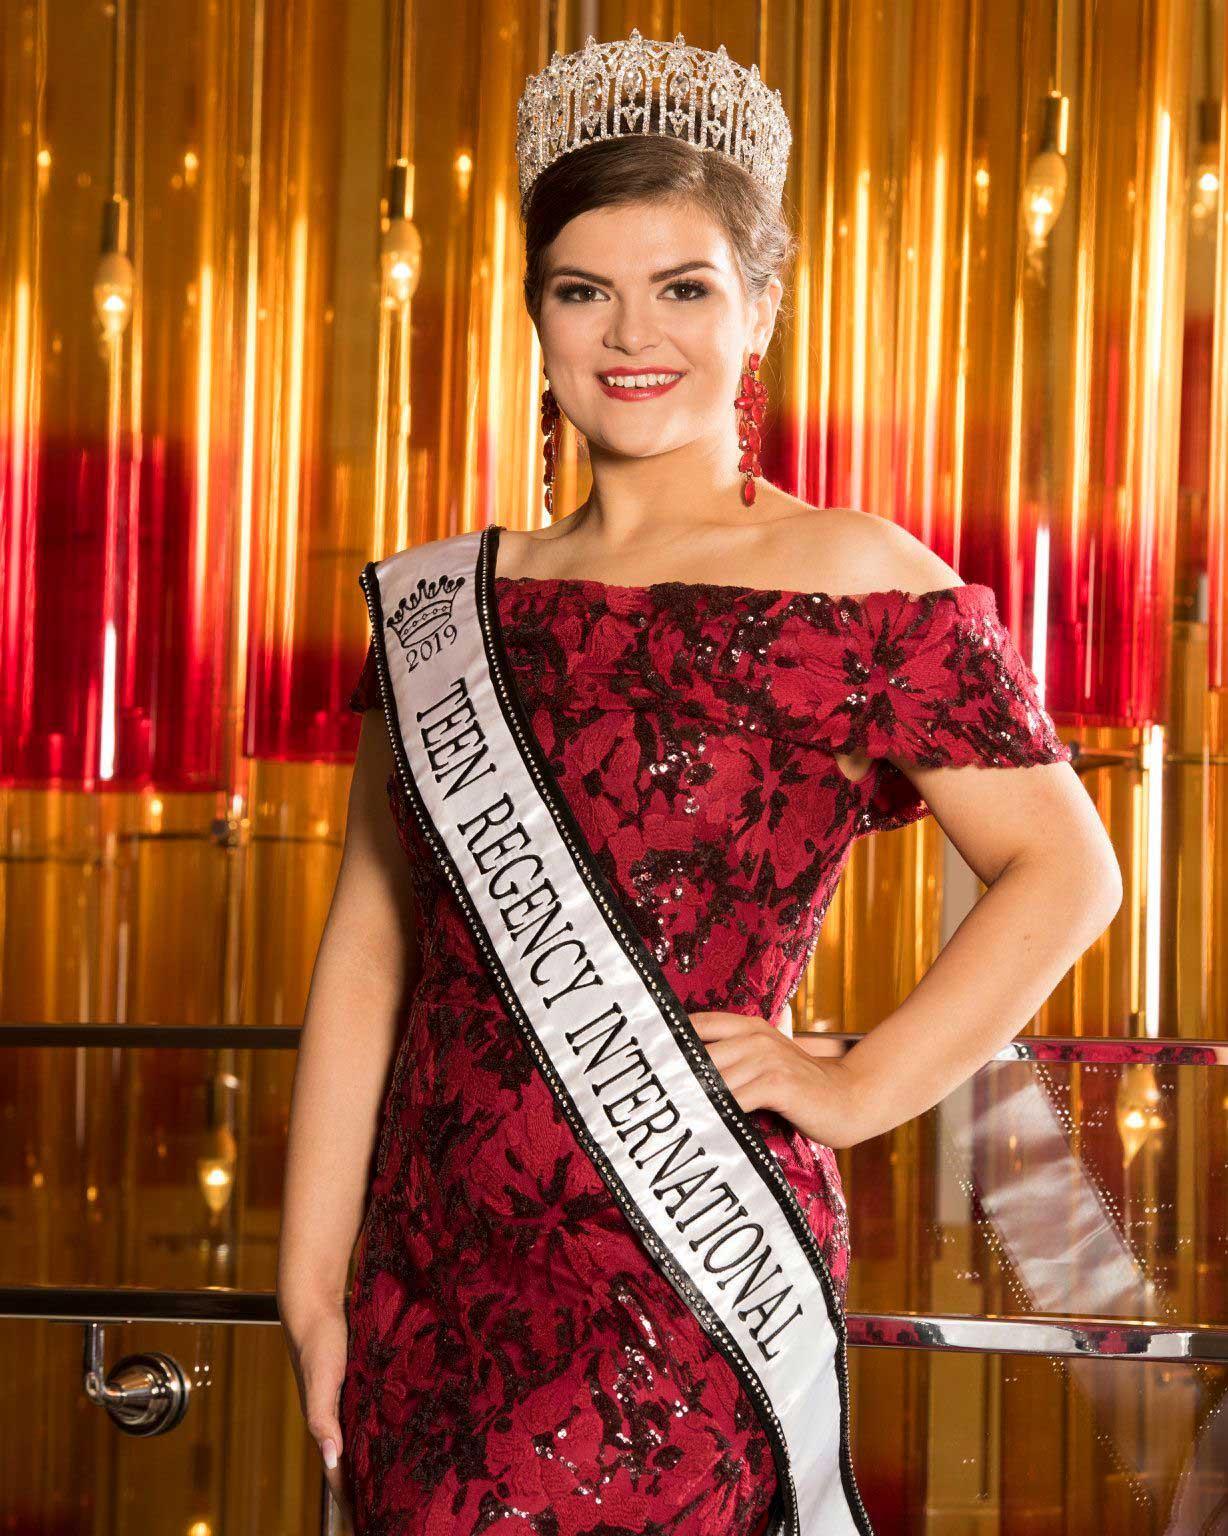 Teen Regency International Pageant 2019-2020 Lucy Rayner